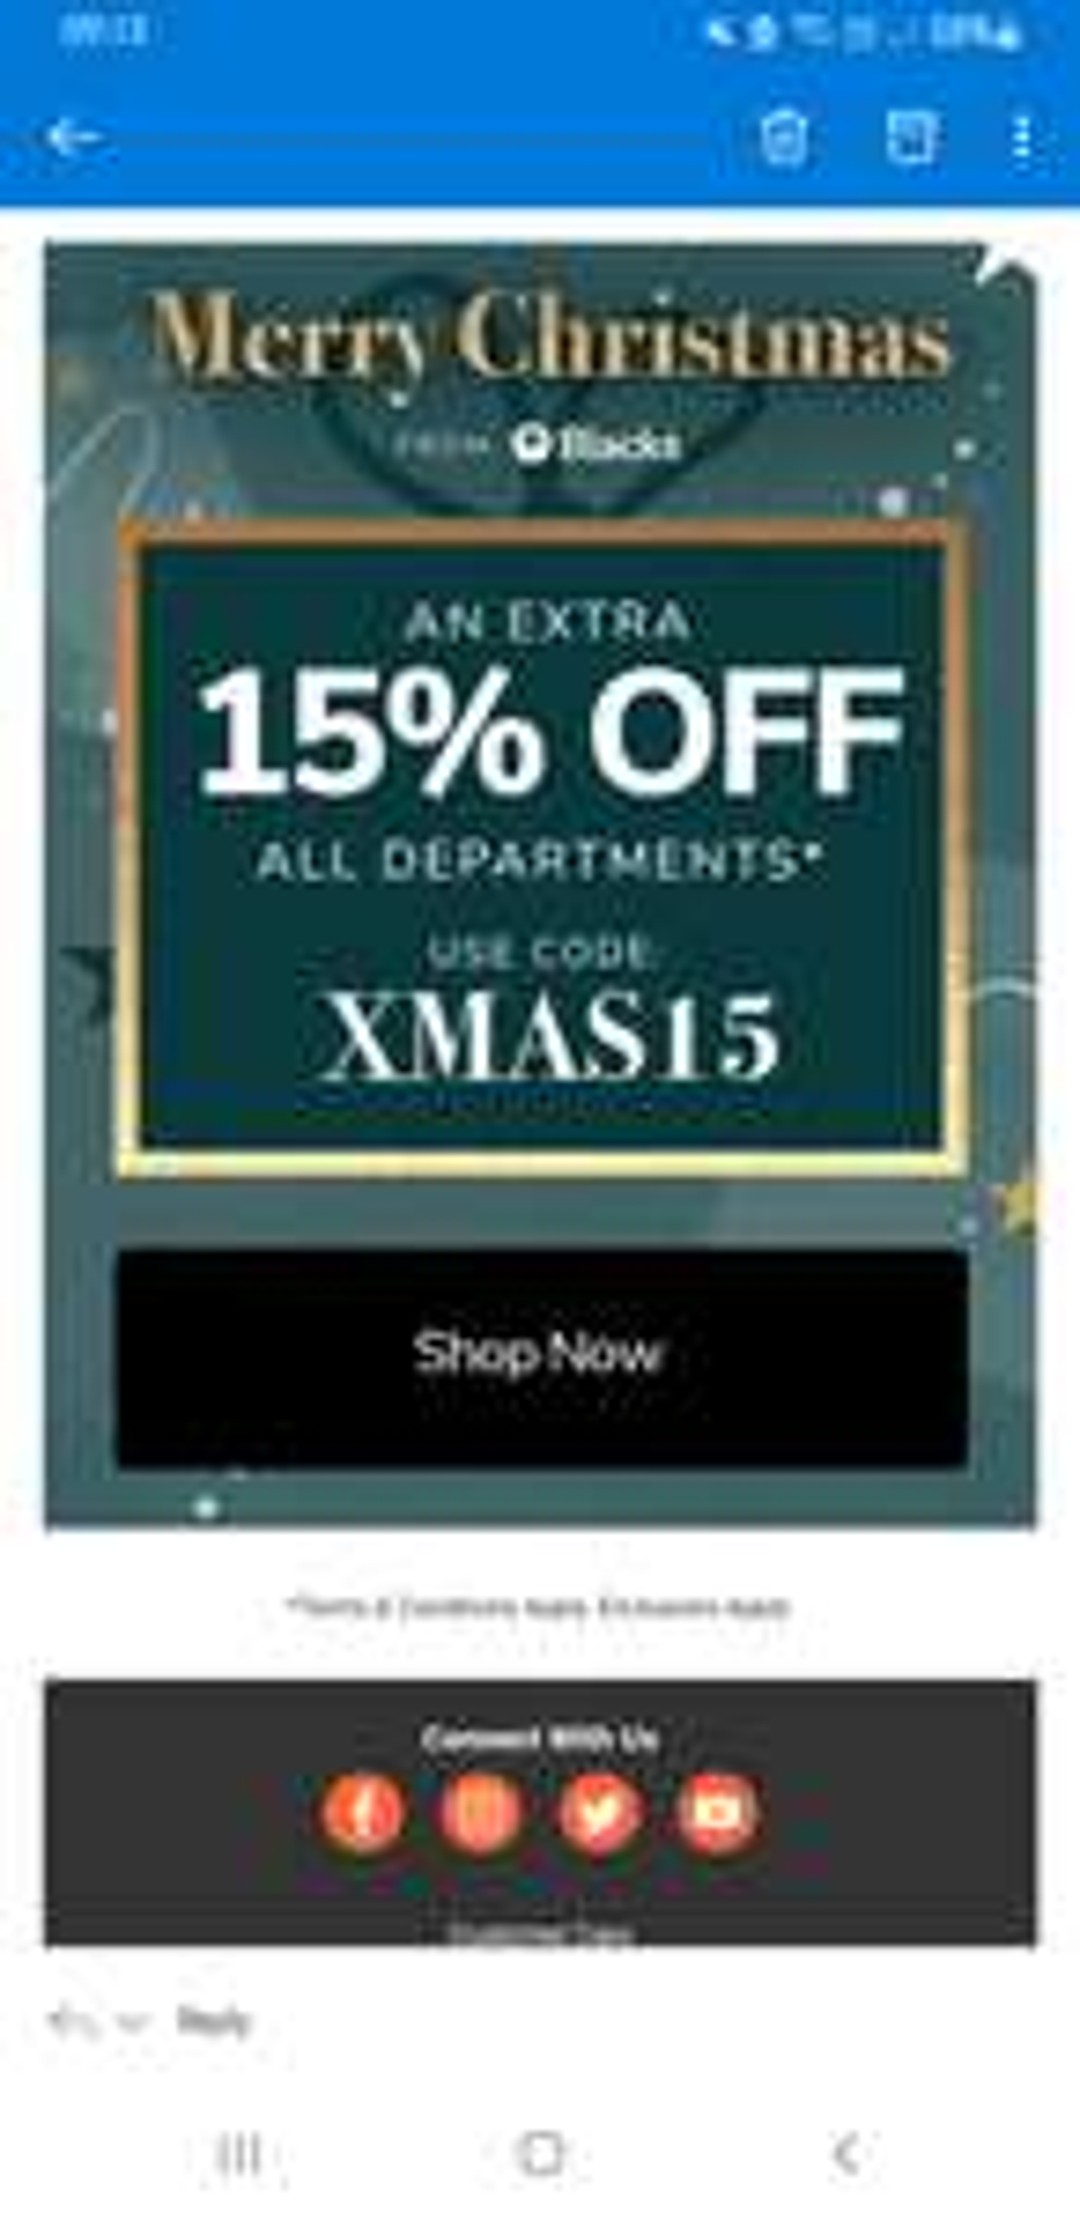 15% off all departments at blacks. Valid until 30/12/2020